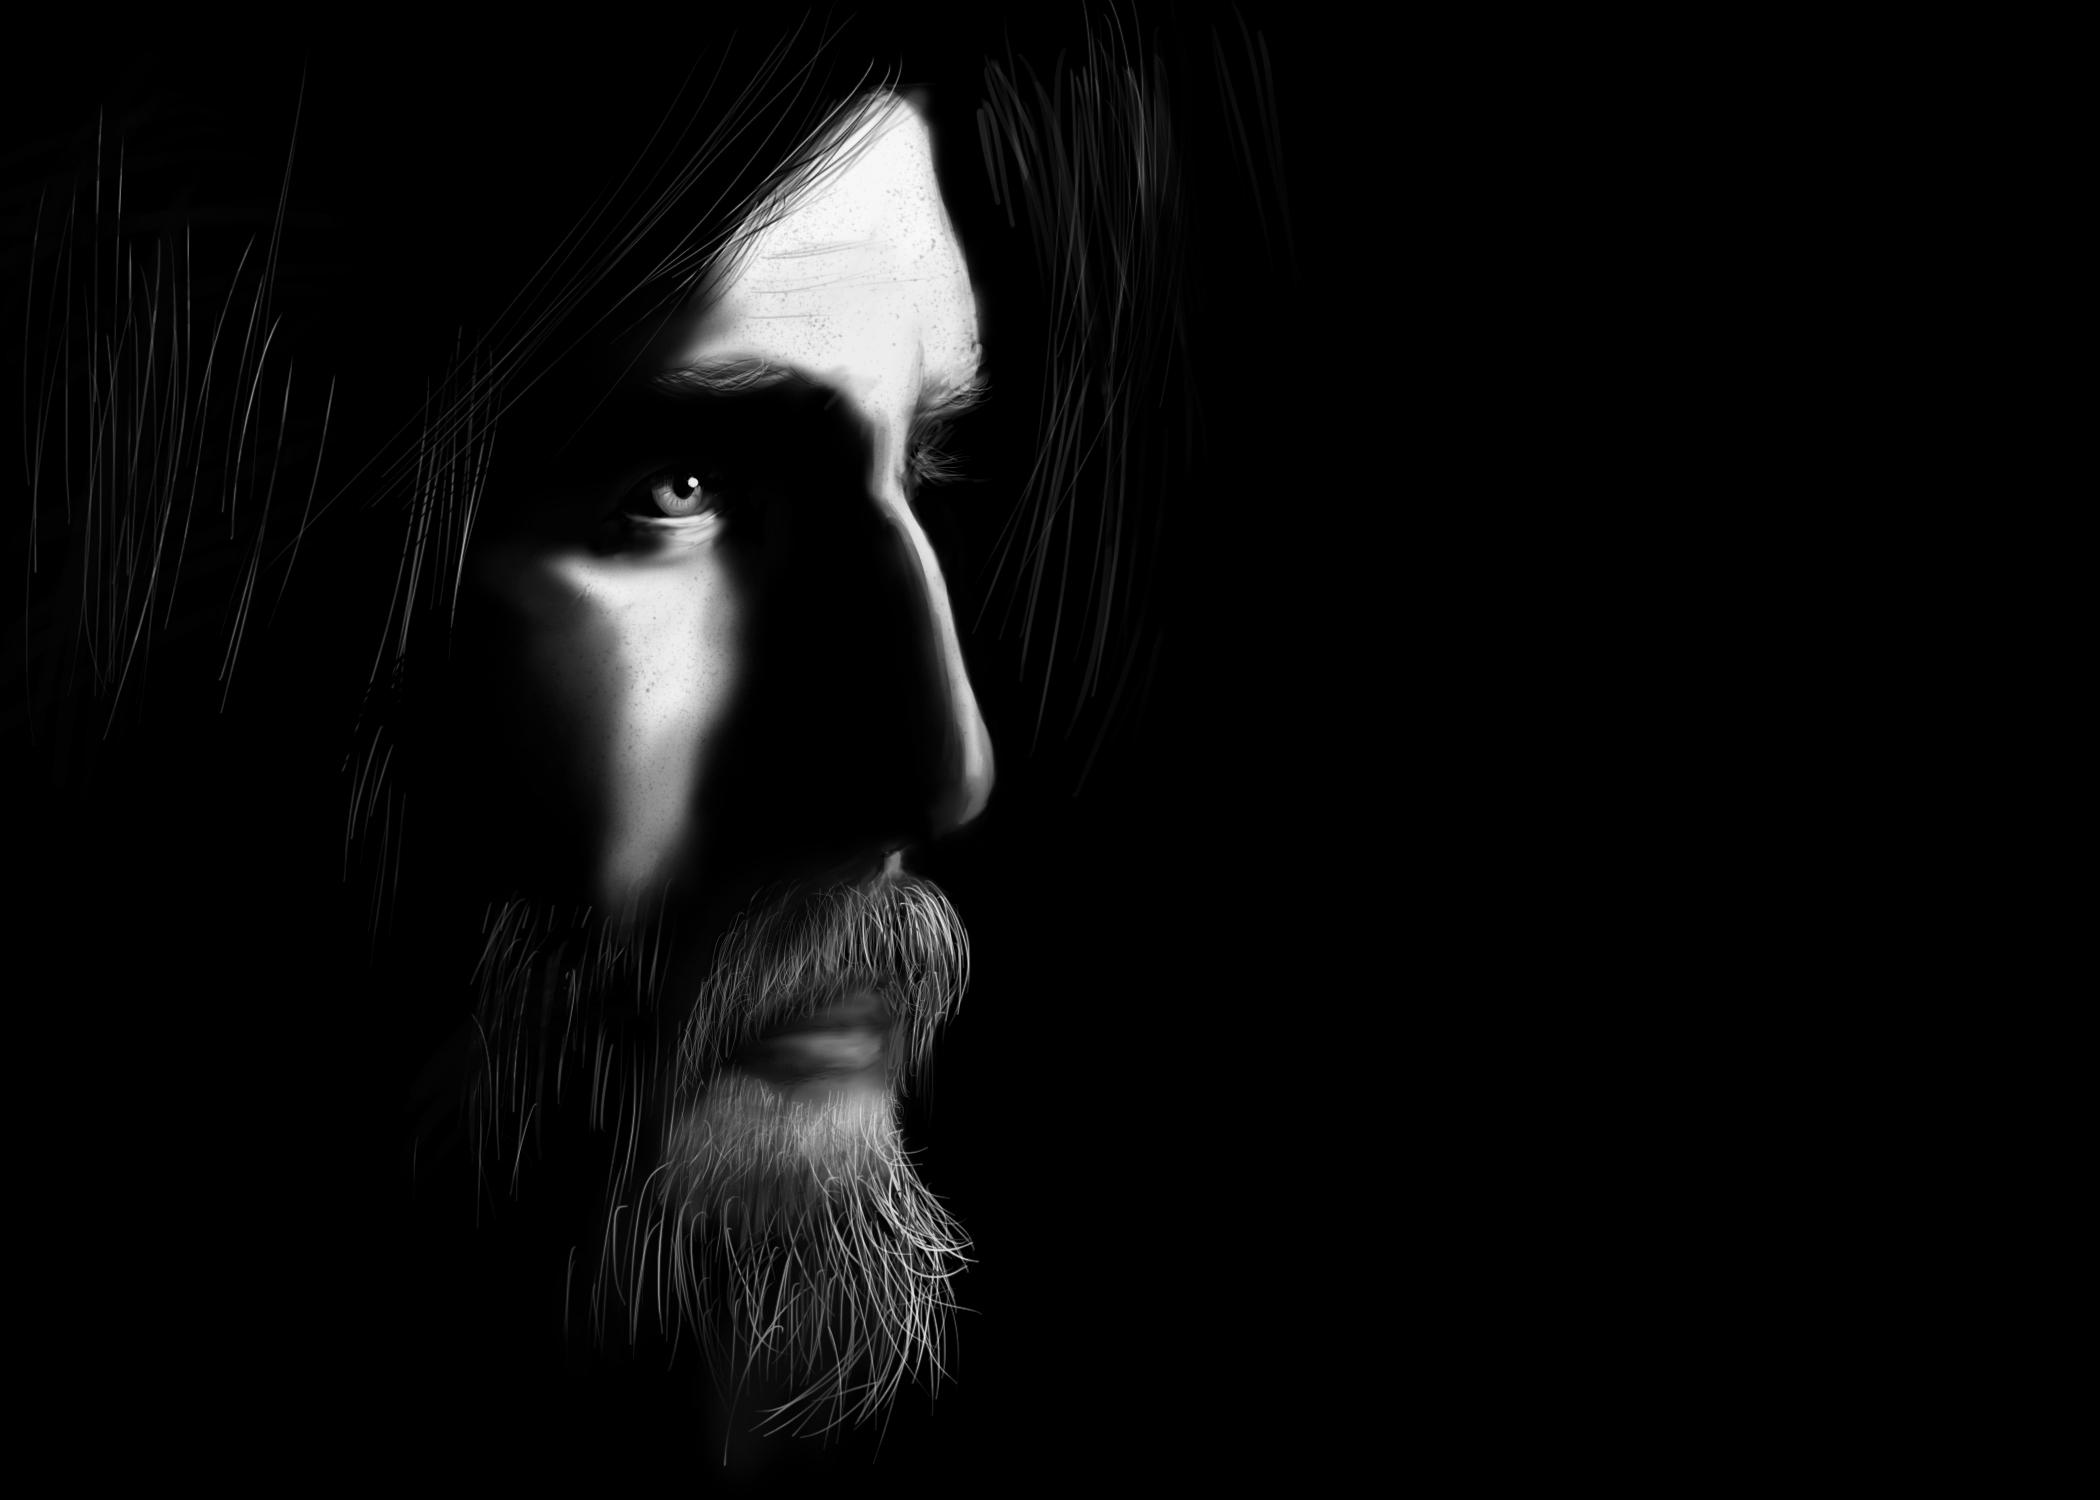 Man In Beard by acemanoj